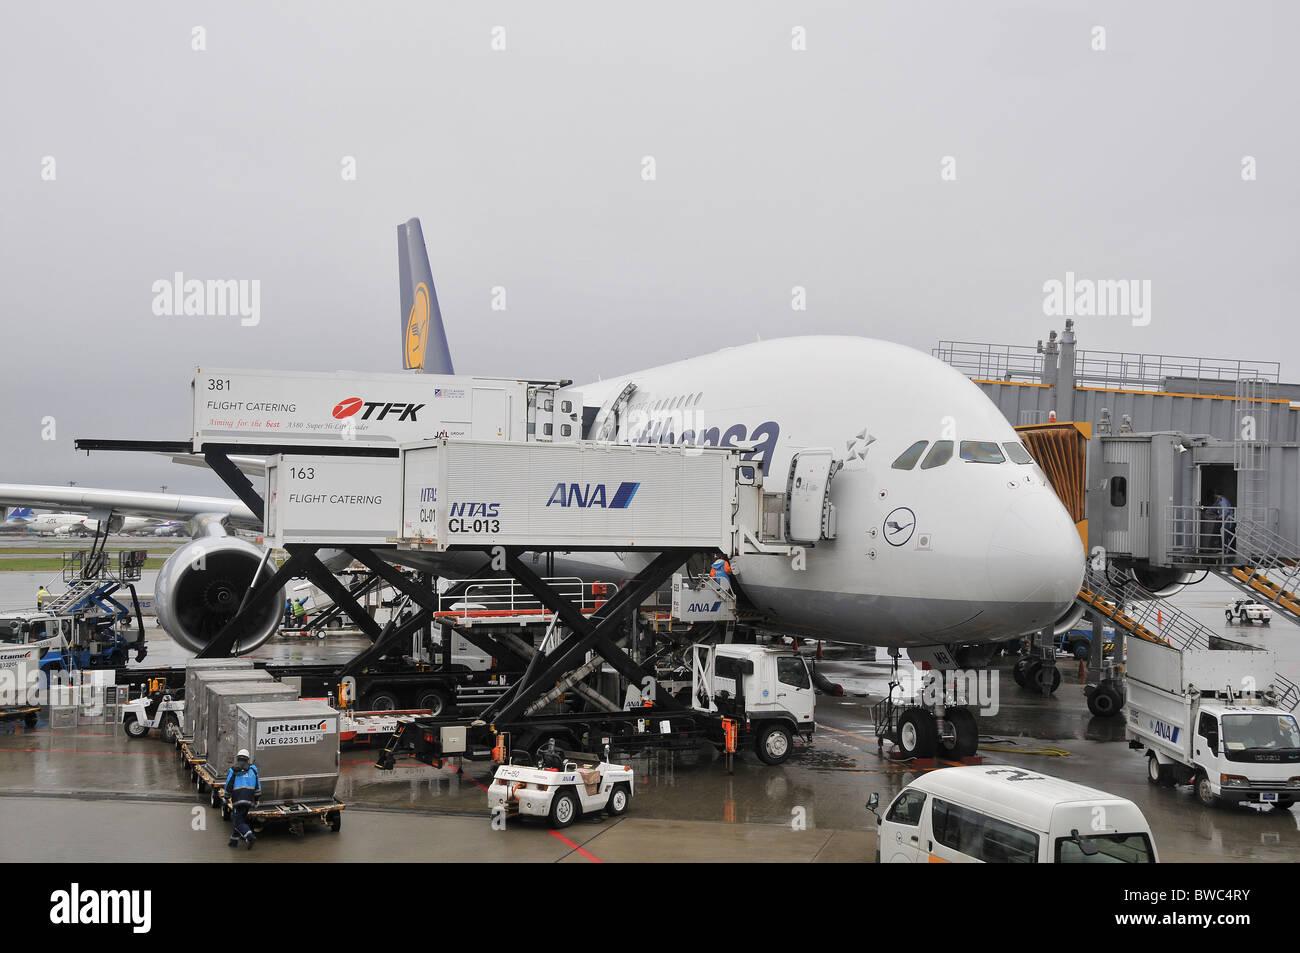 Aibus A 380, Lufthansa airlines, Narita airport, Japan - Stock Image